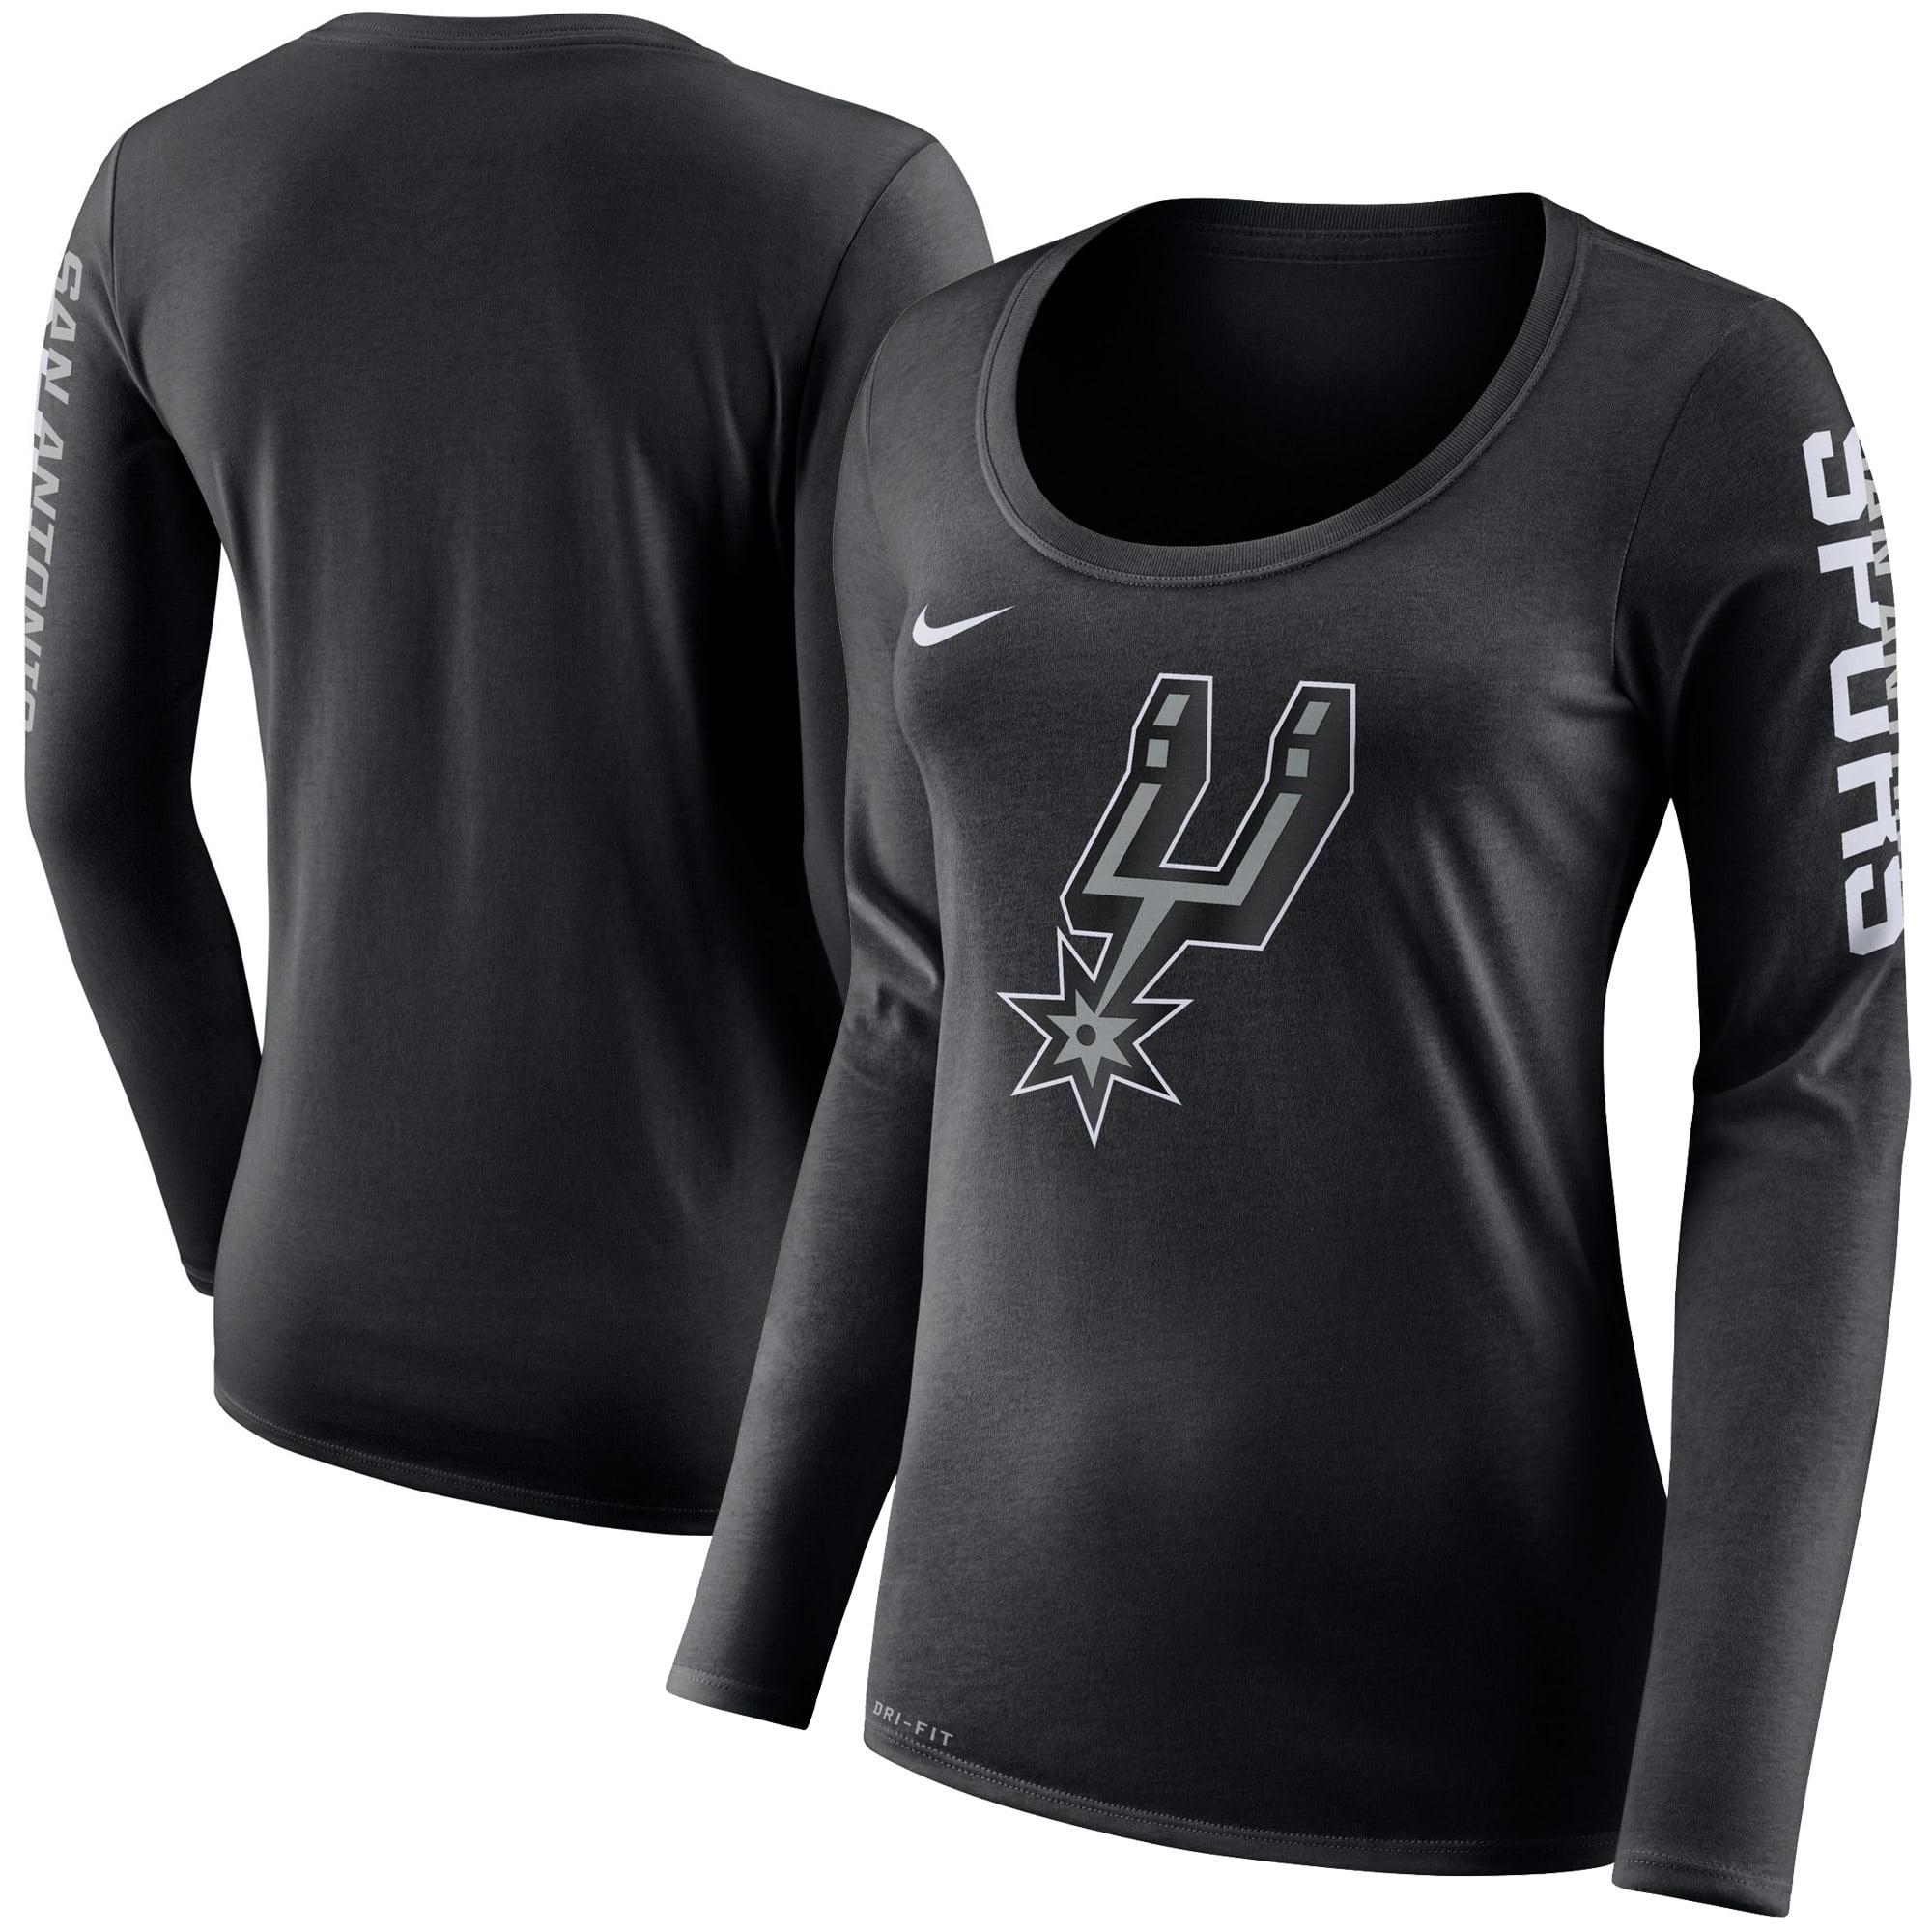 San Antonio Spurs Nike Women's Primary Logo Long-Sleeve T-Shirt - Black